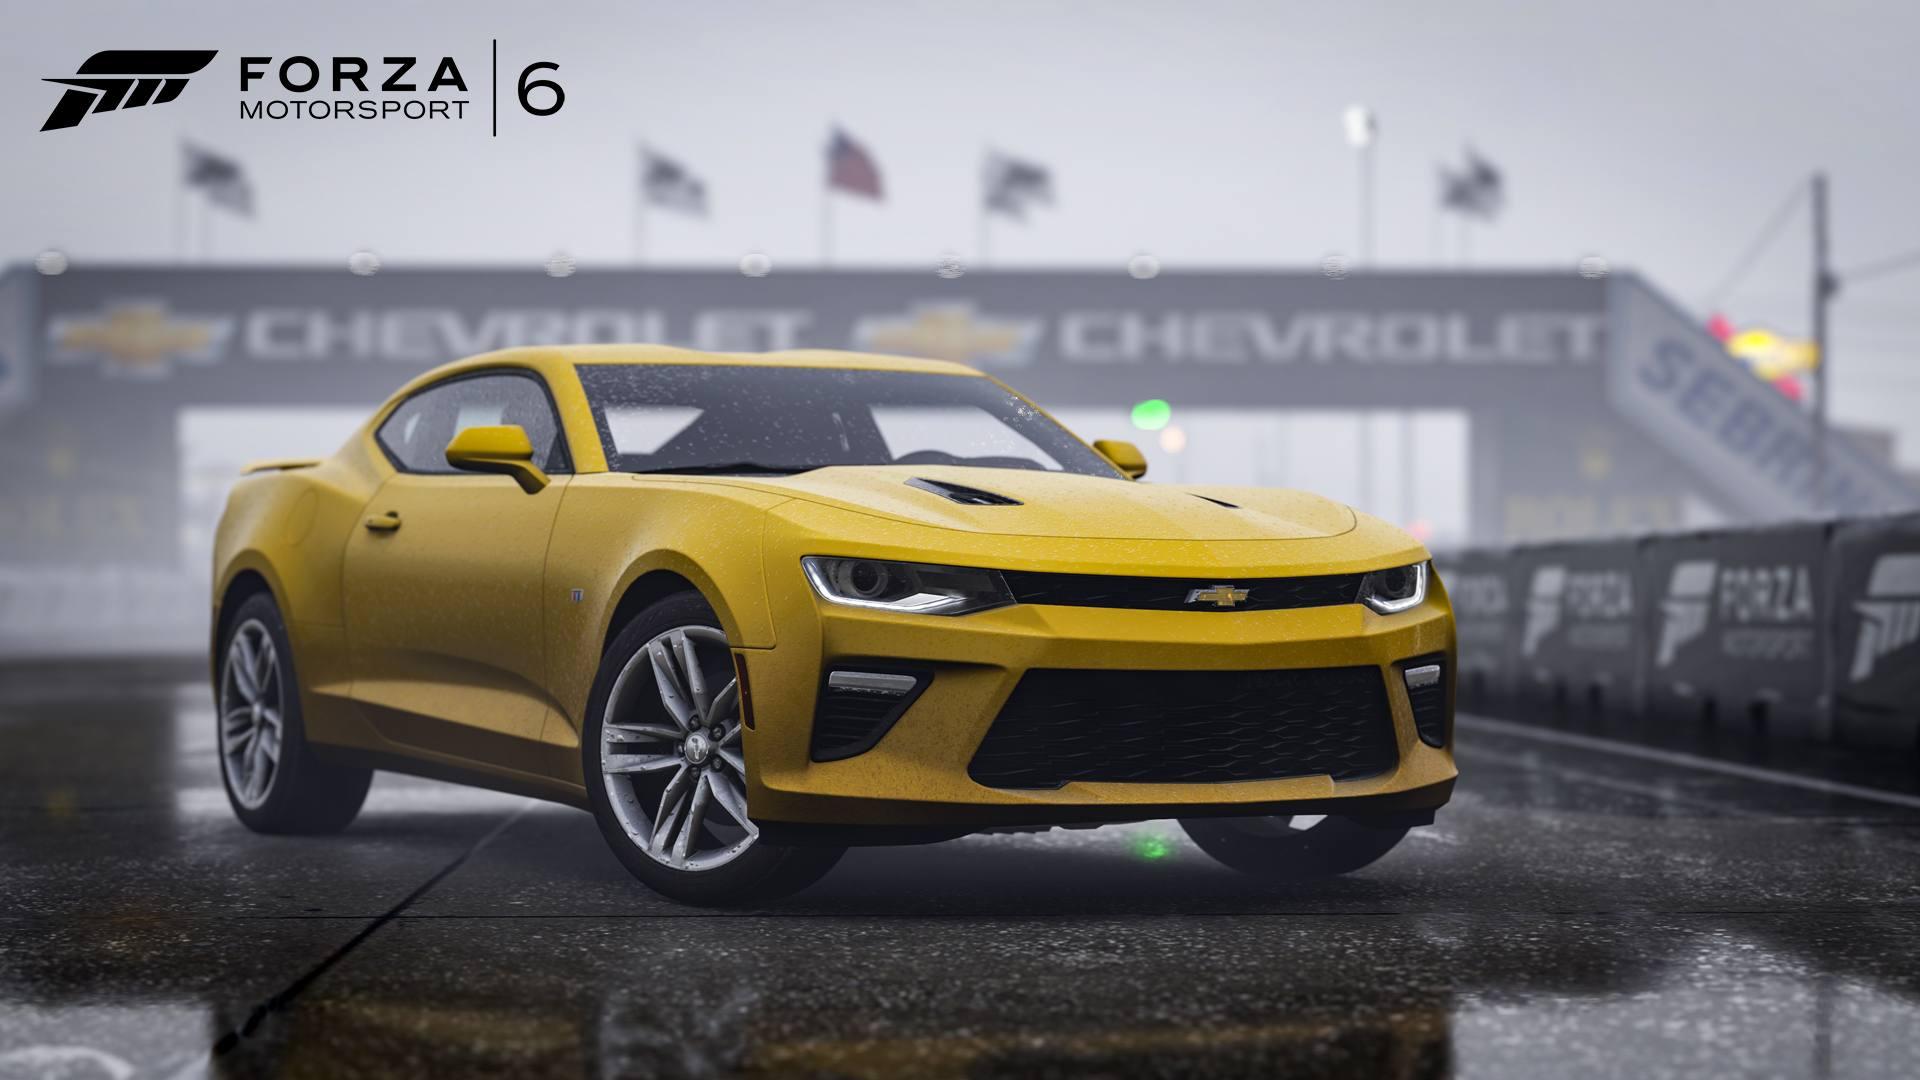 Forza Motorsport 6 DLC Hot Wheels 03-05-16 2016 Chevrolet Camaro Super Sport